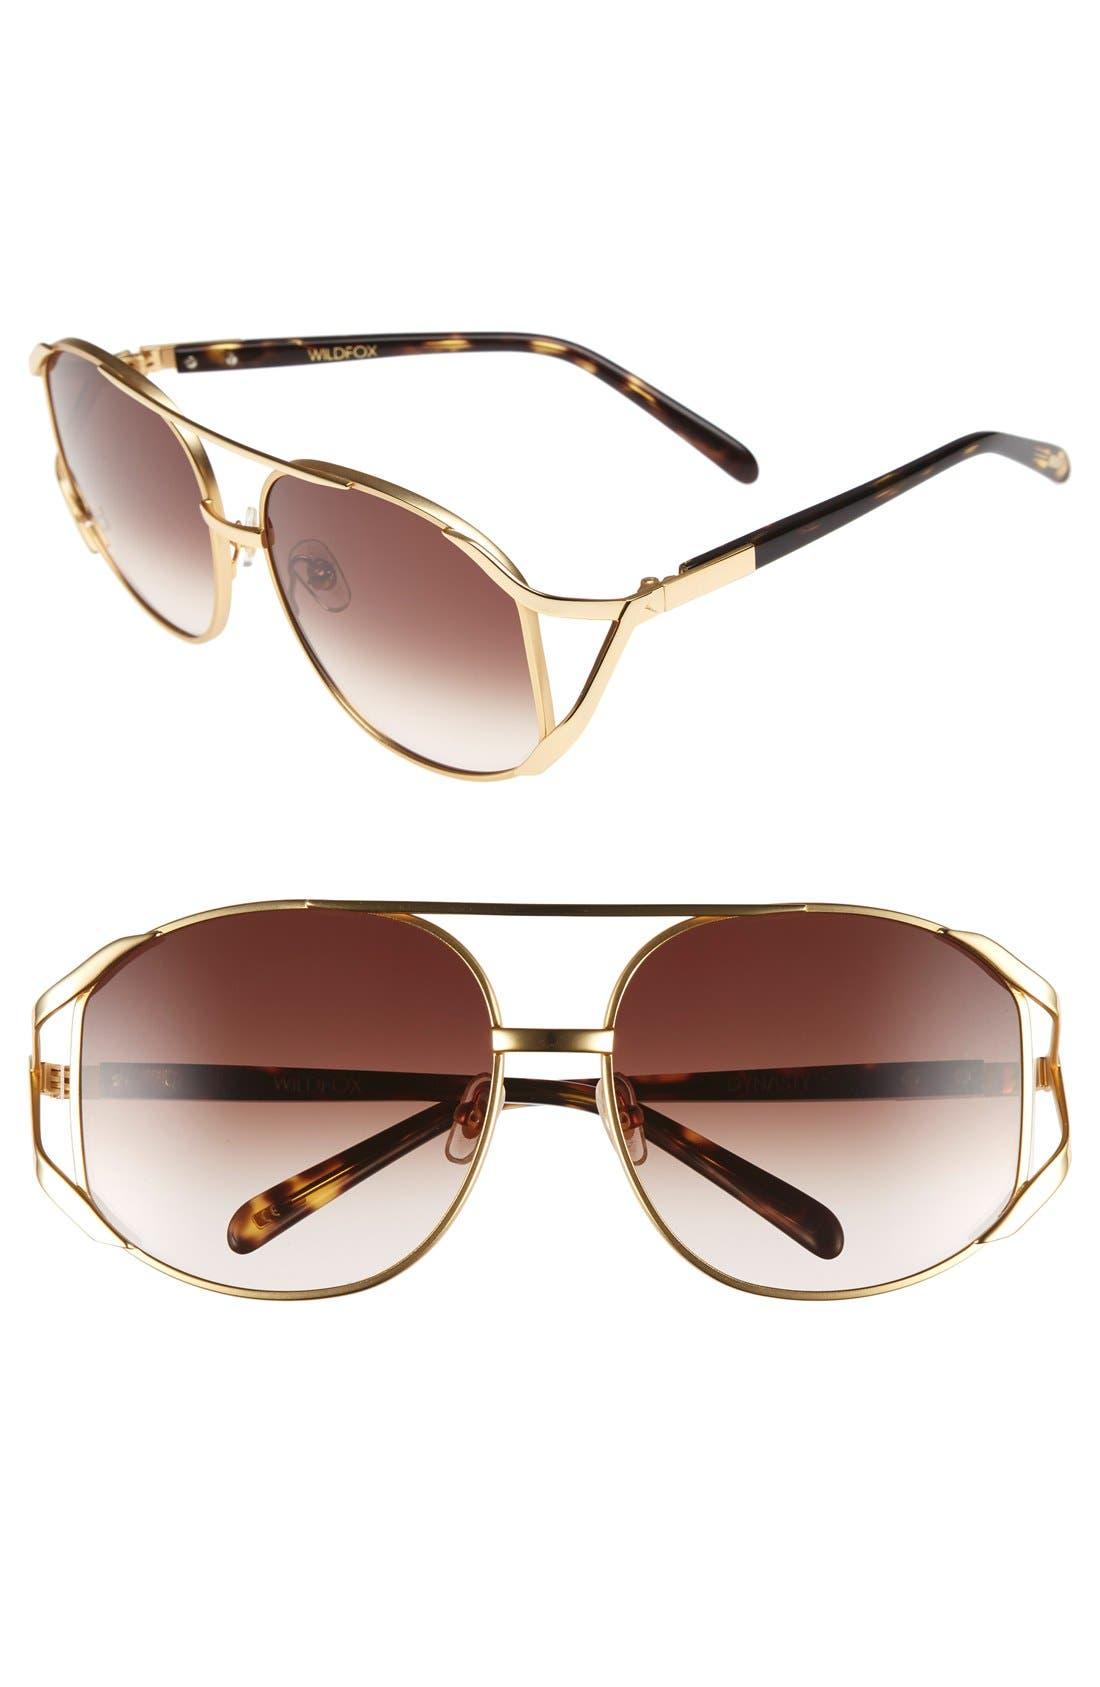 Wildfox 'Dynasty' 59mm Retro Sunglasses